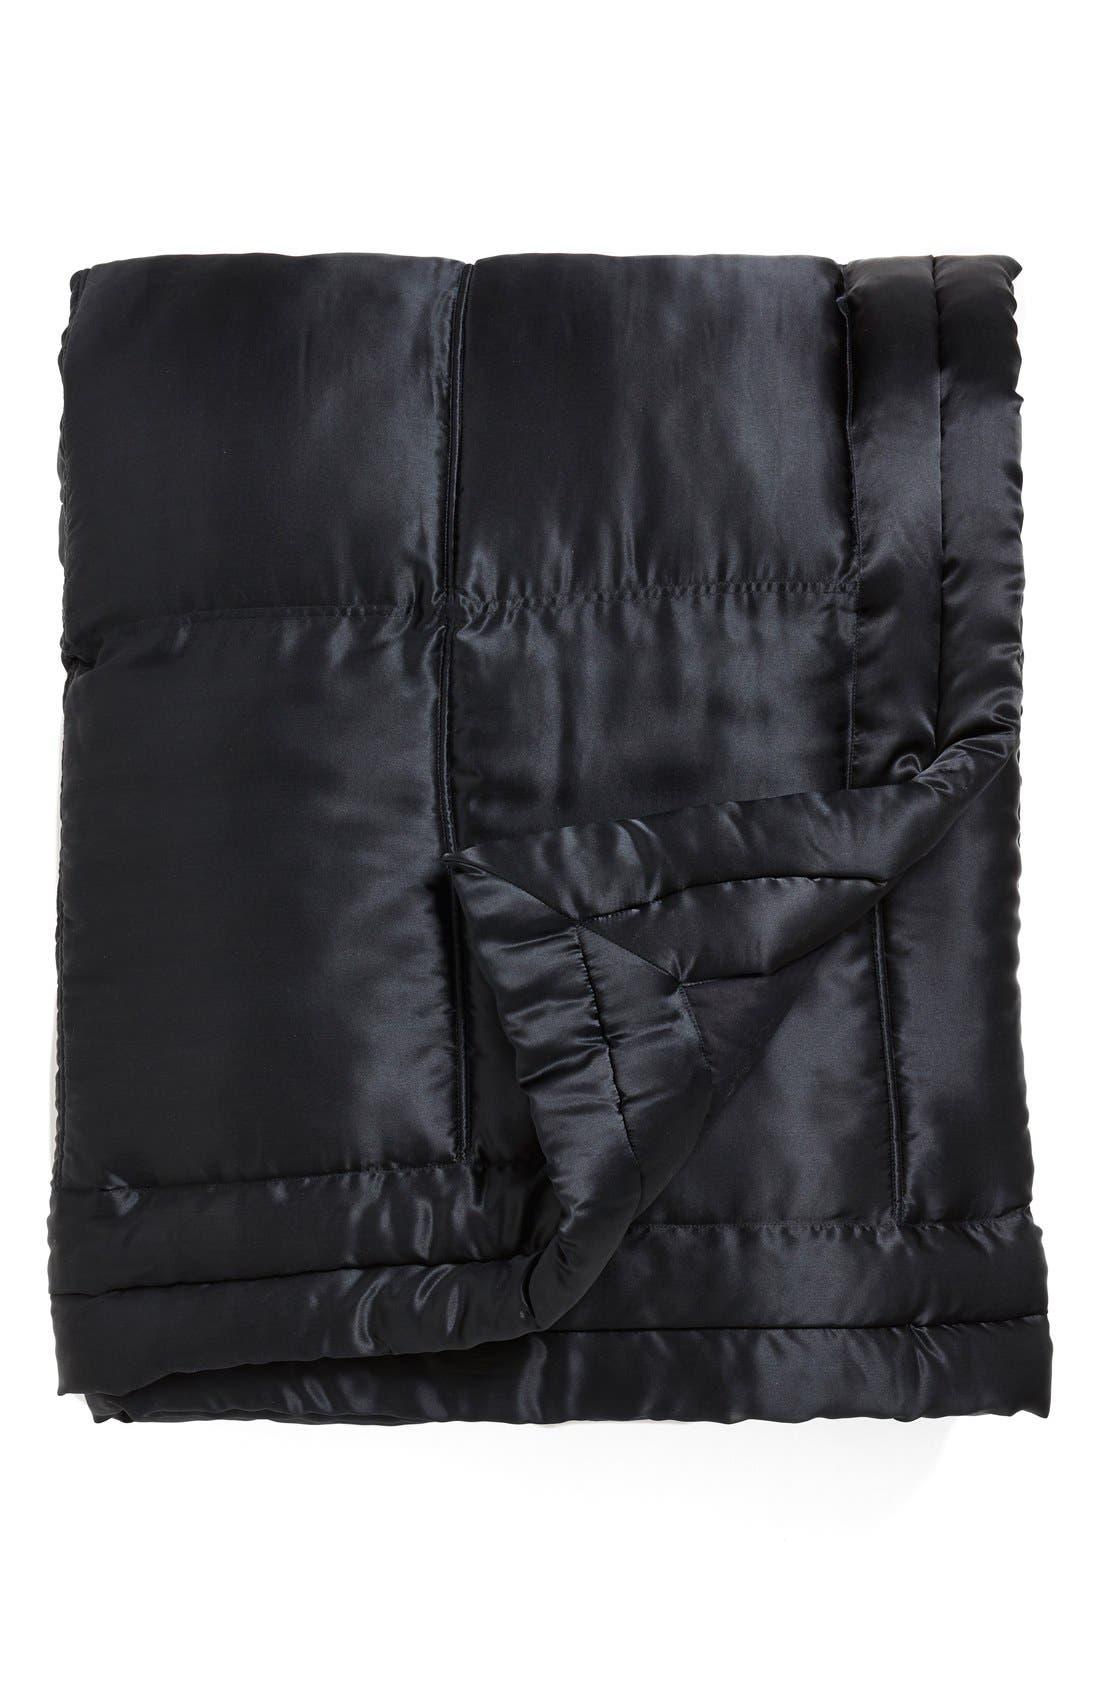 Donna Karan Collection 'Impression' Silk Charmeuse Quilt,                         Main,                         color, 004